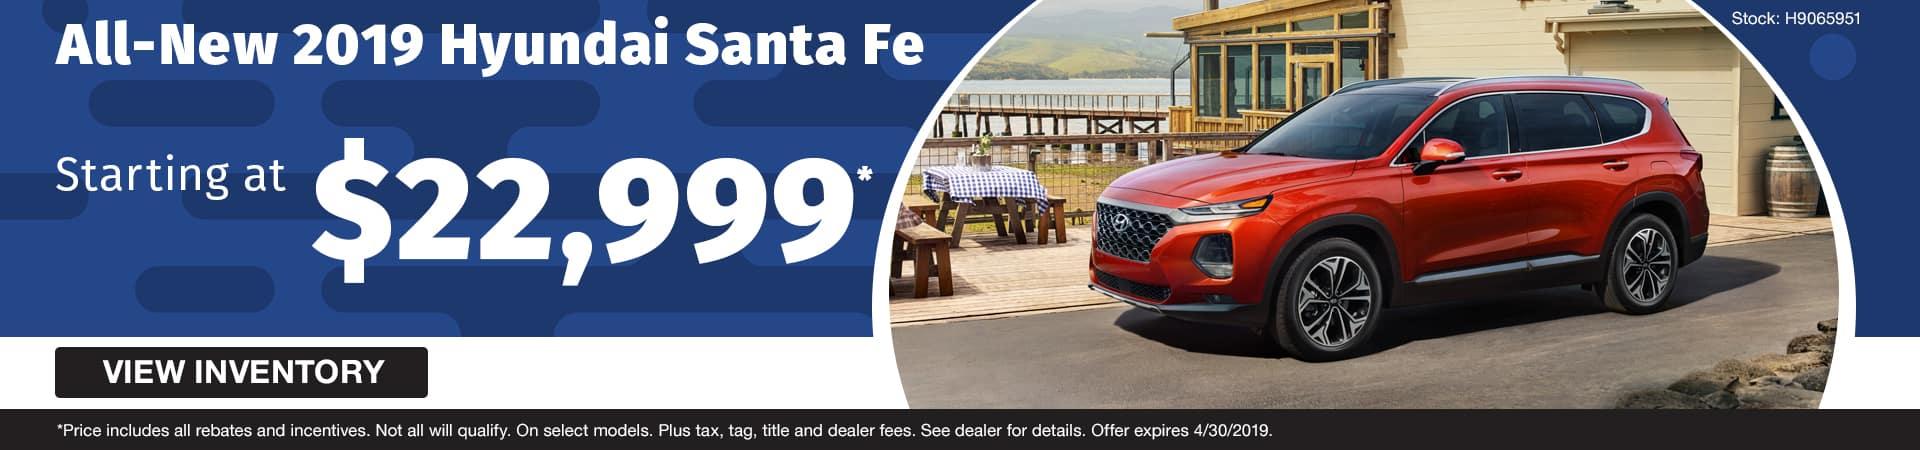 Drive an all-new 2019 Hyundai Santa Fe starting at just $22,999 in Murfreesboro TN